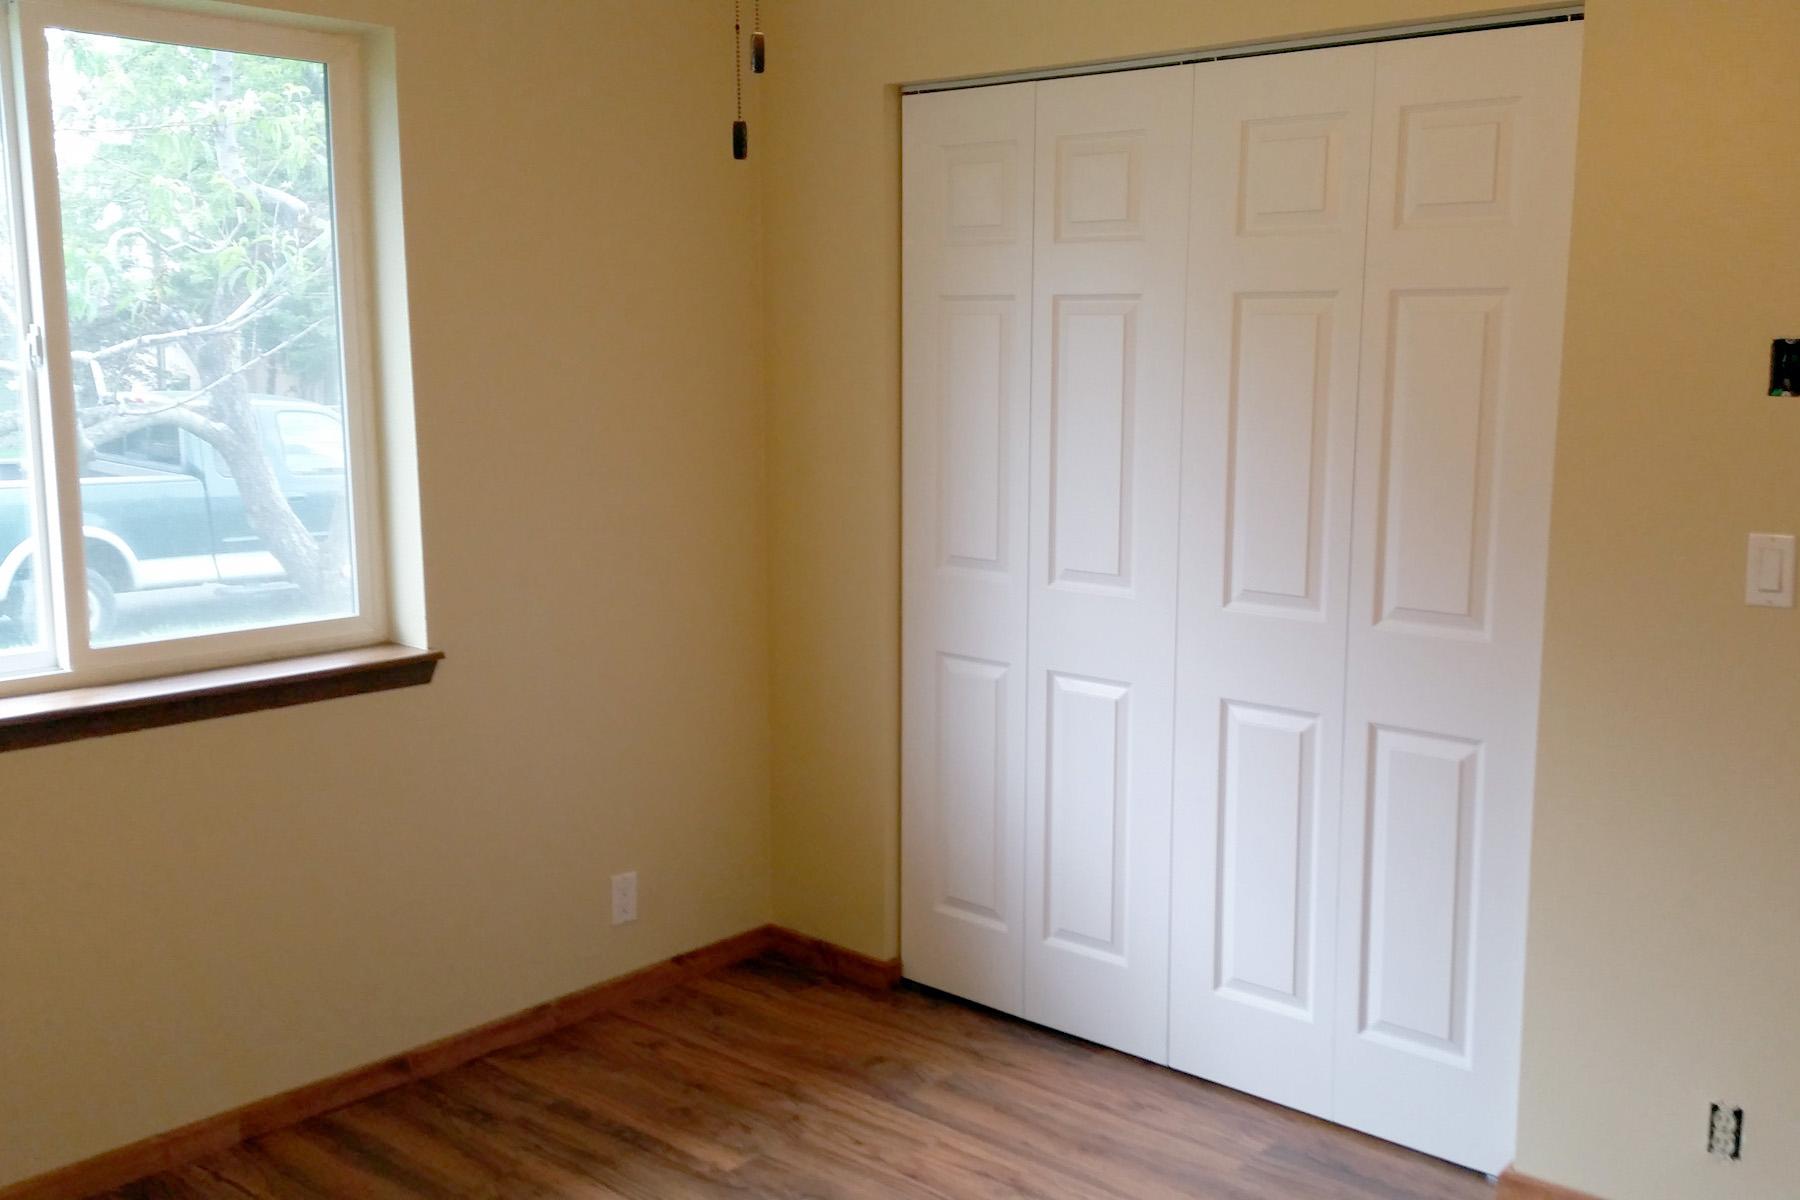 Terrance's Room